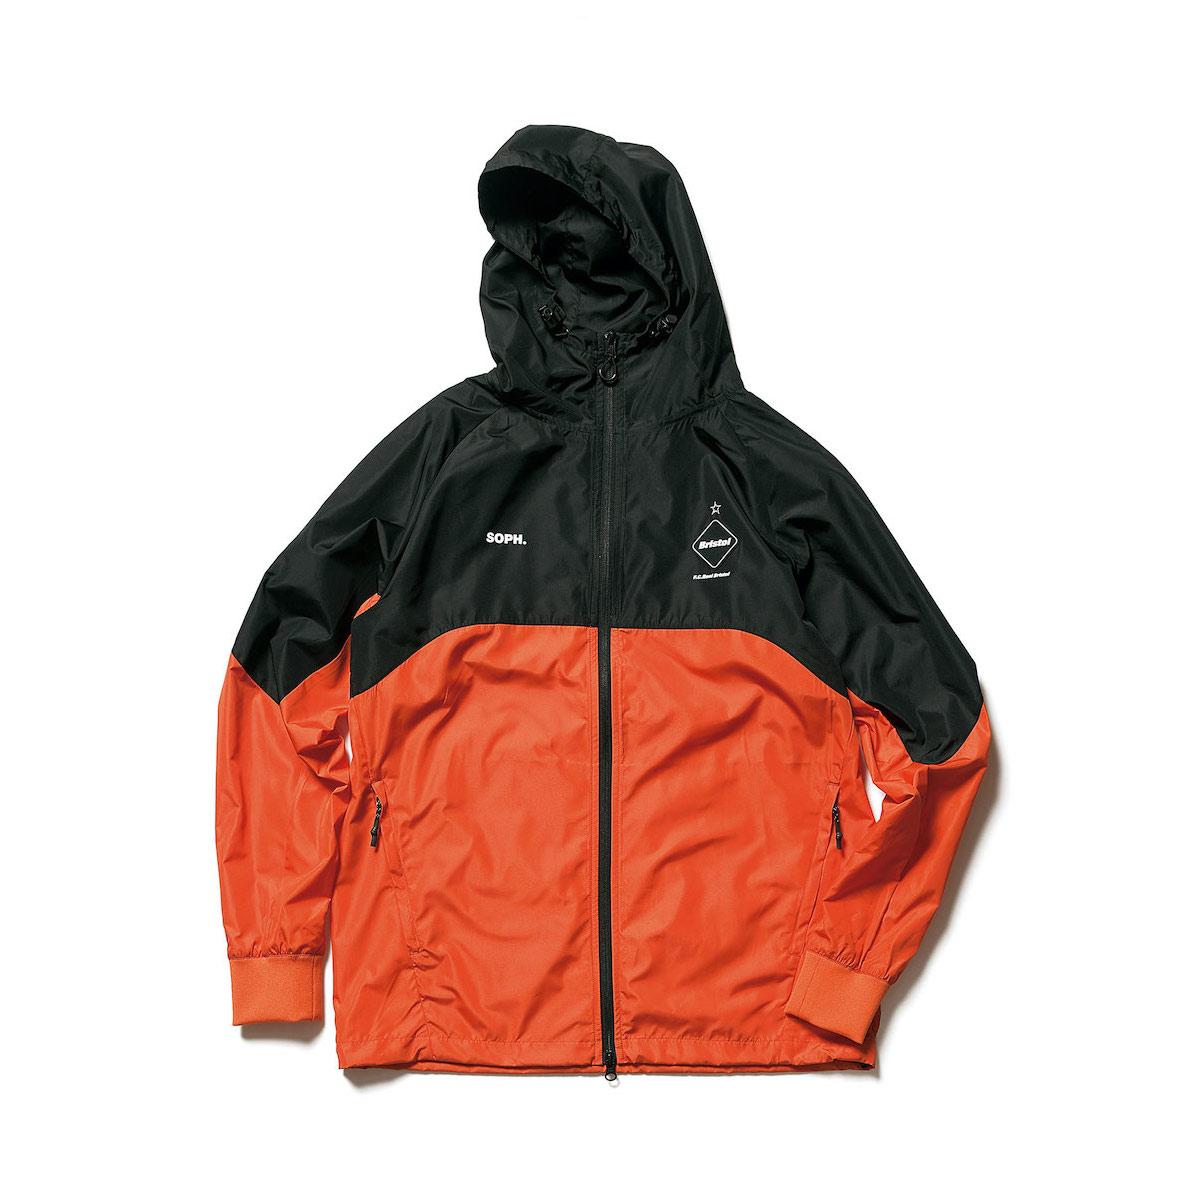 F.C.Real Bristol / VENTILATION TRACK JACKET (orange)